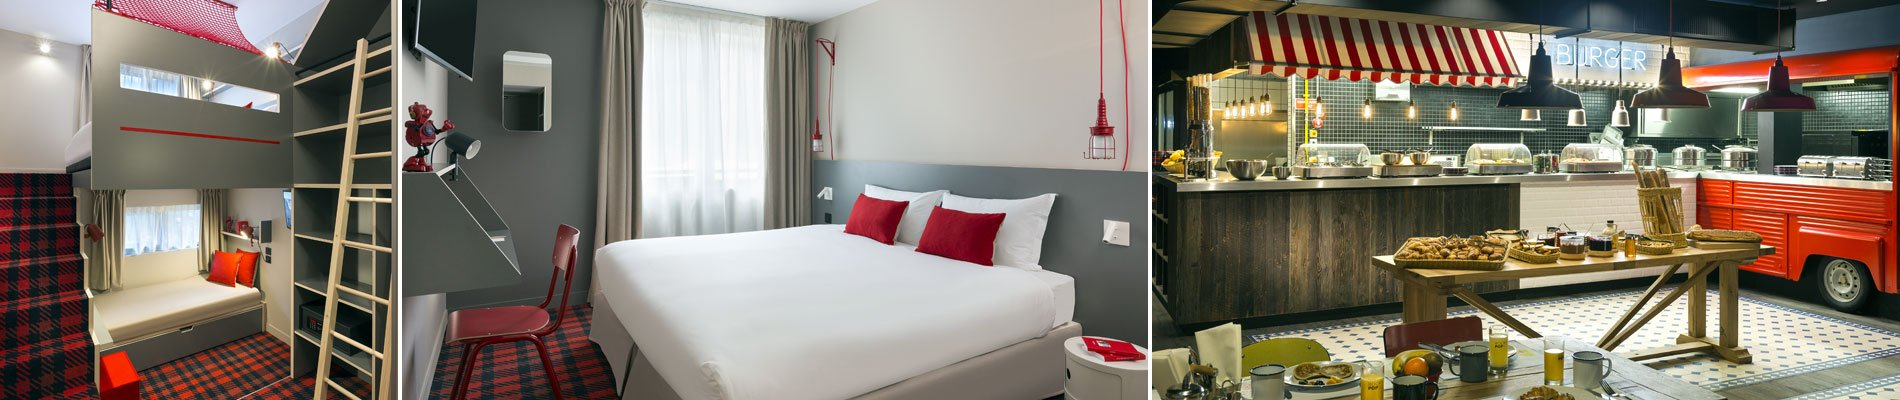 rocky-pop-hotel-les-houches-chamonix